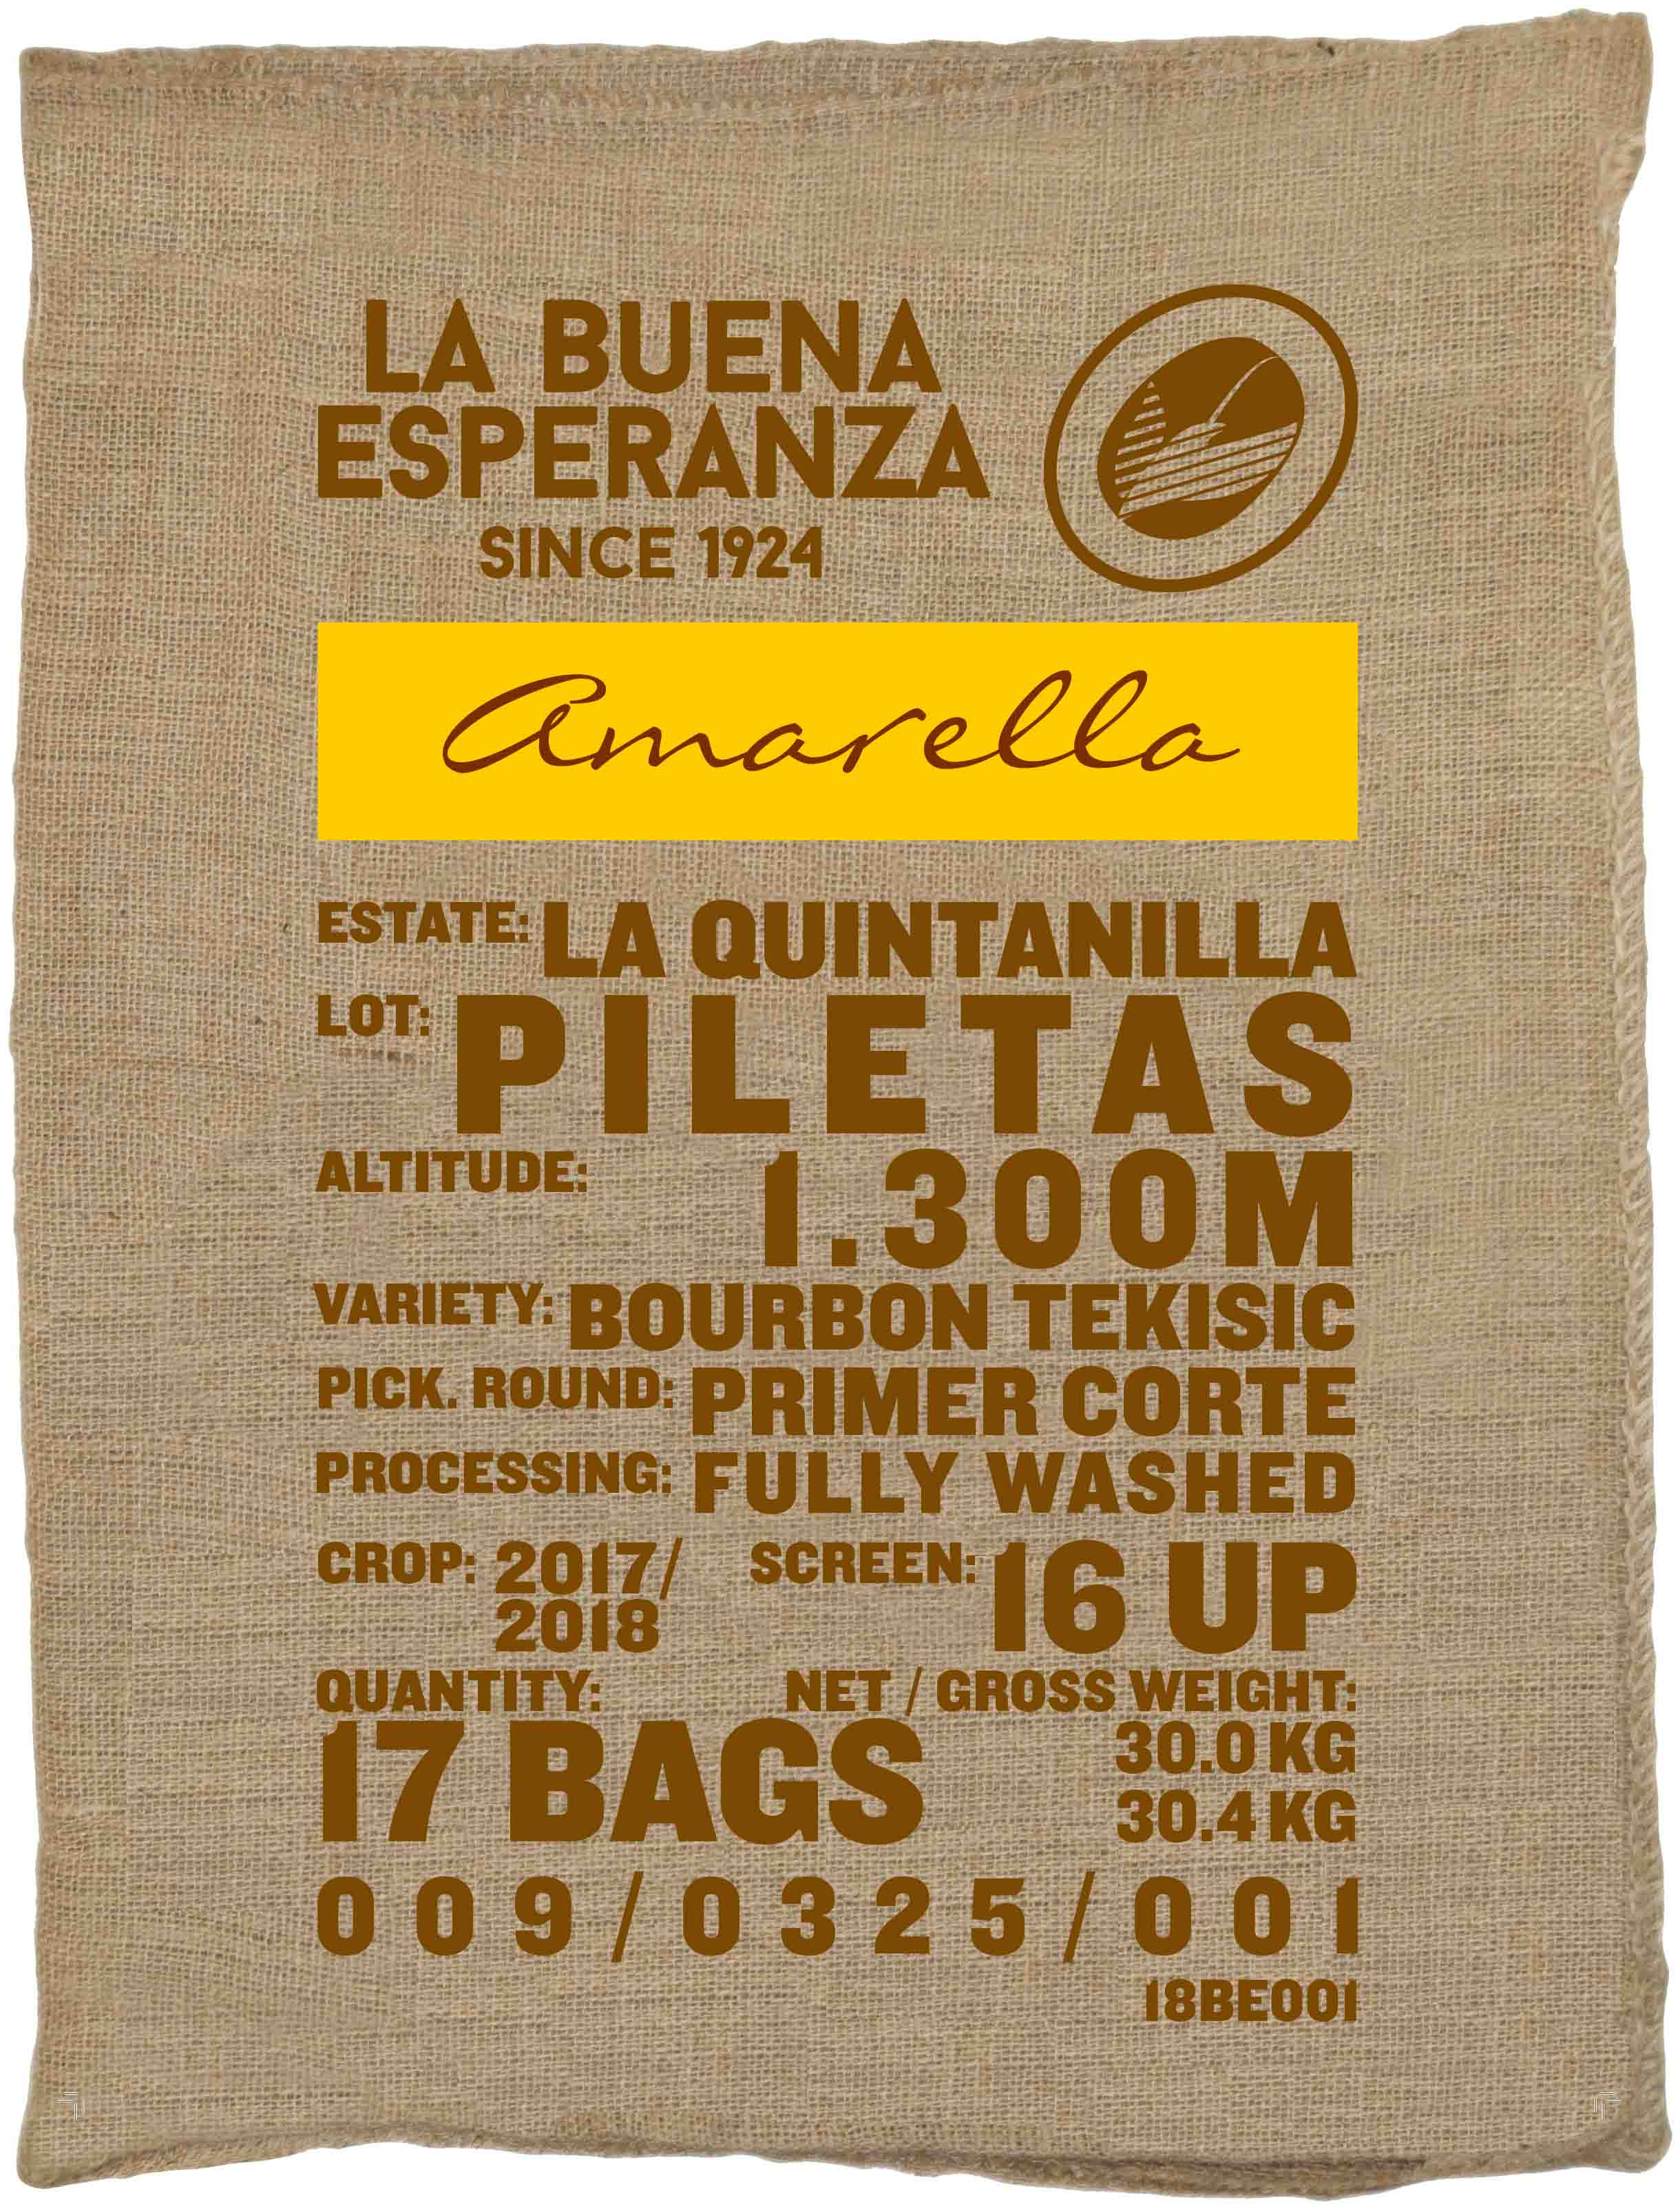 Ein Rohkaffeesack amarella Parzellenkaffee Varietät Bourbon Tekisic. Finca La Buena Esperanza Lot Piletas.